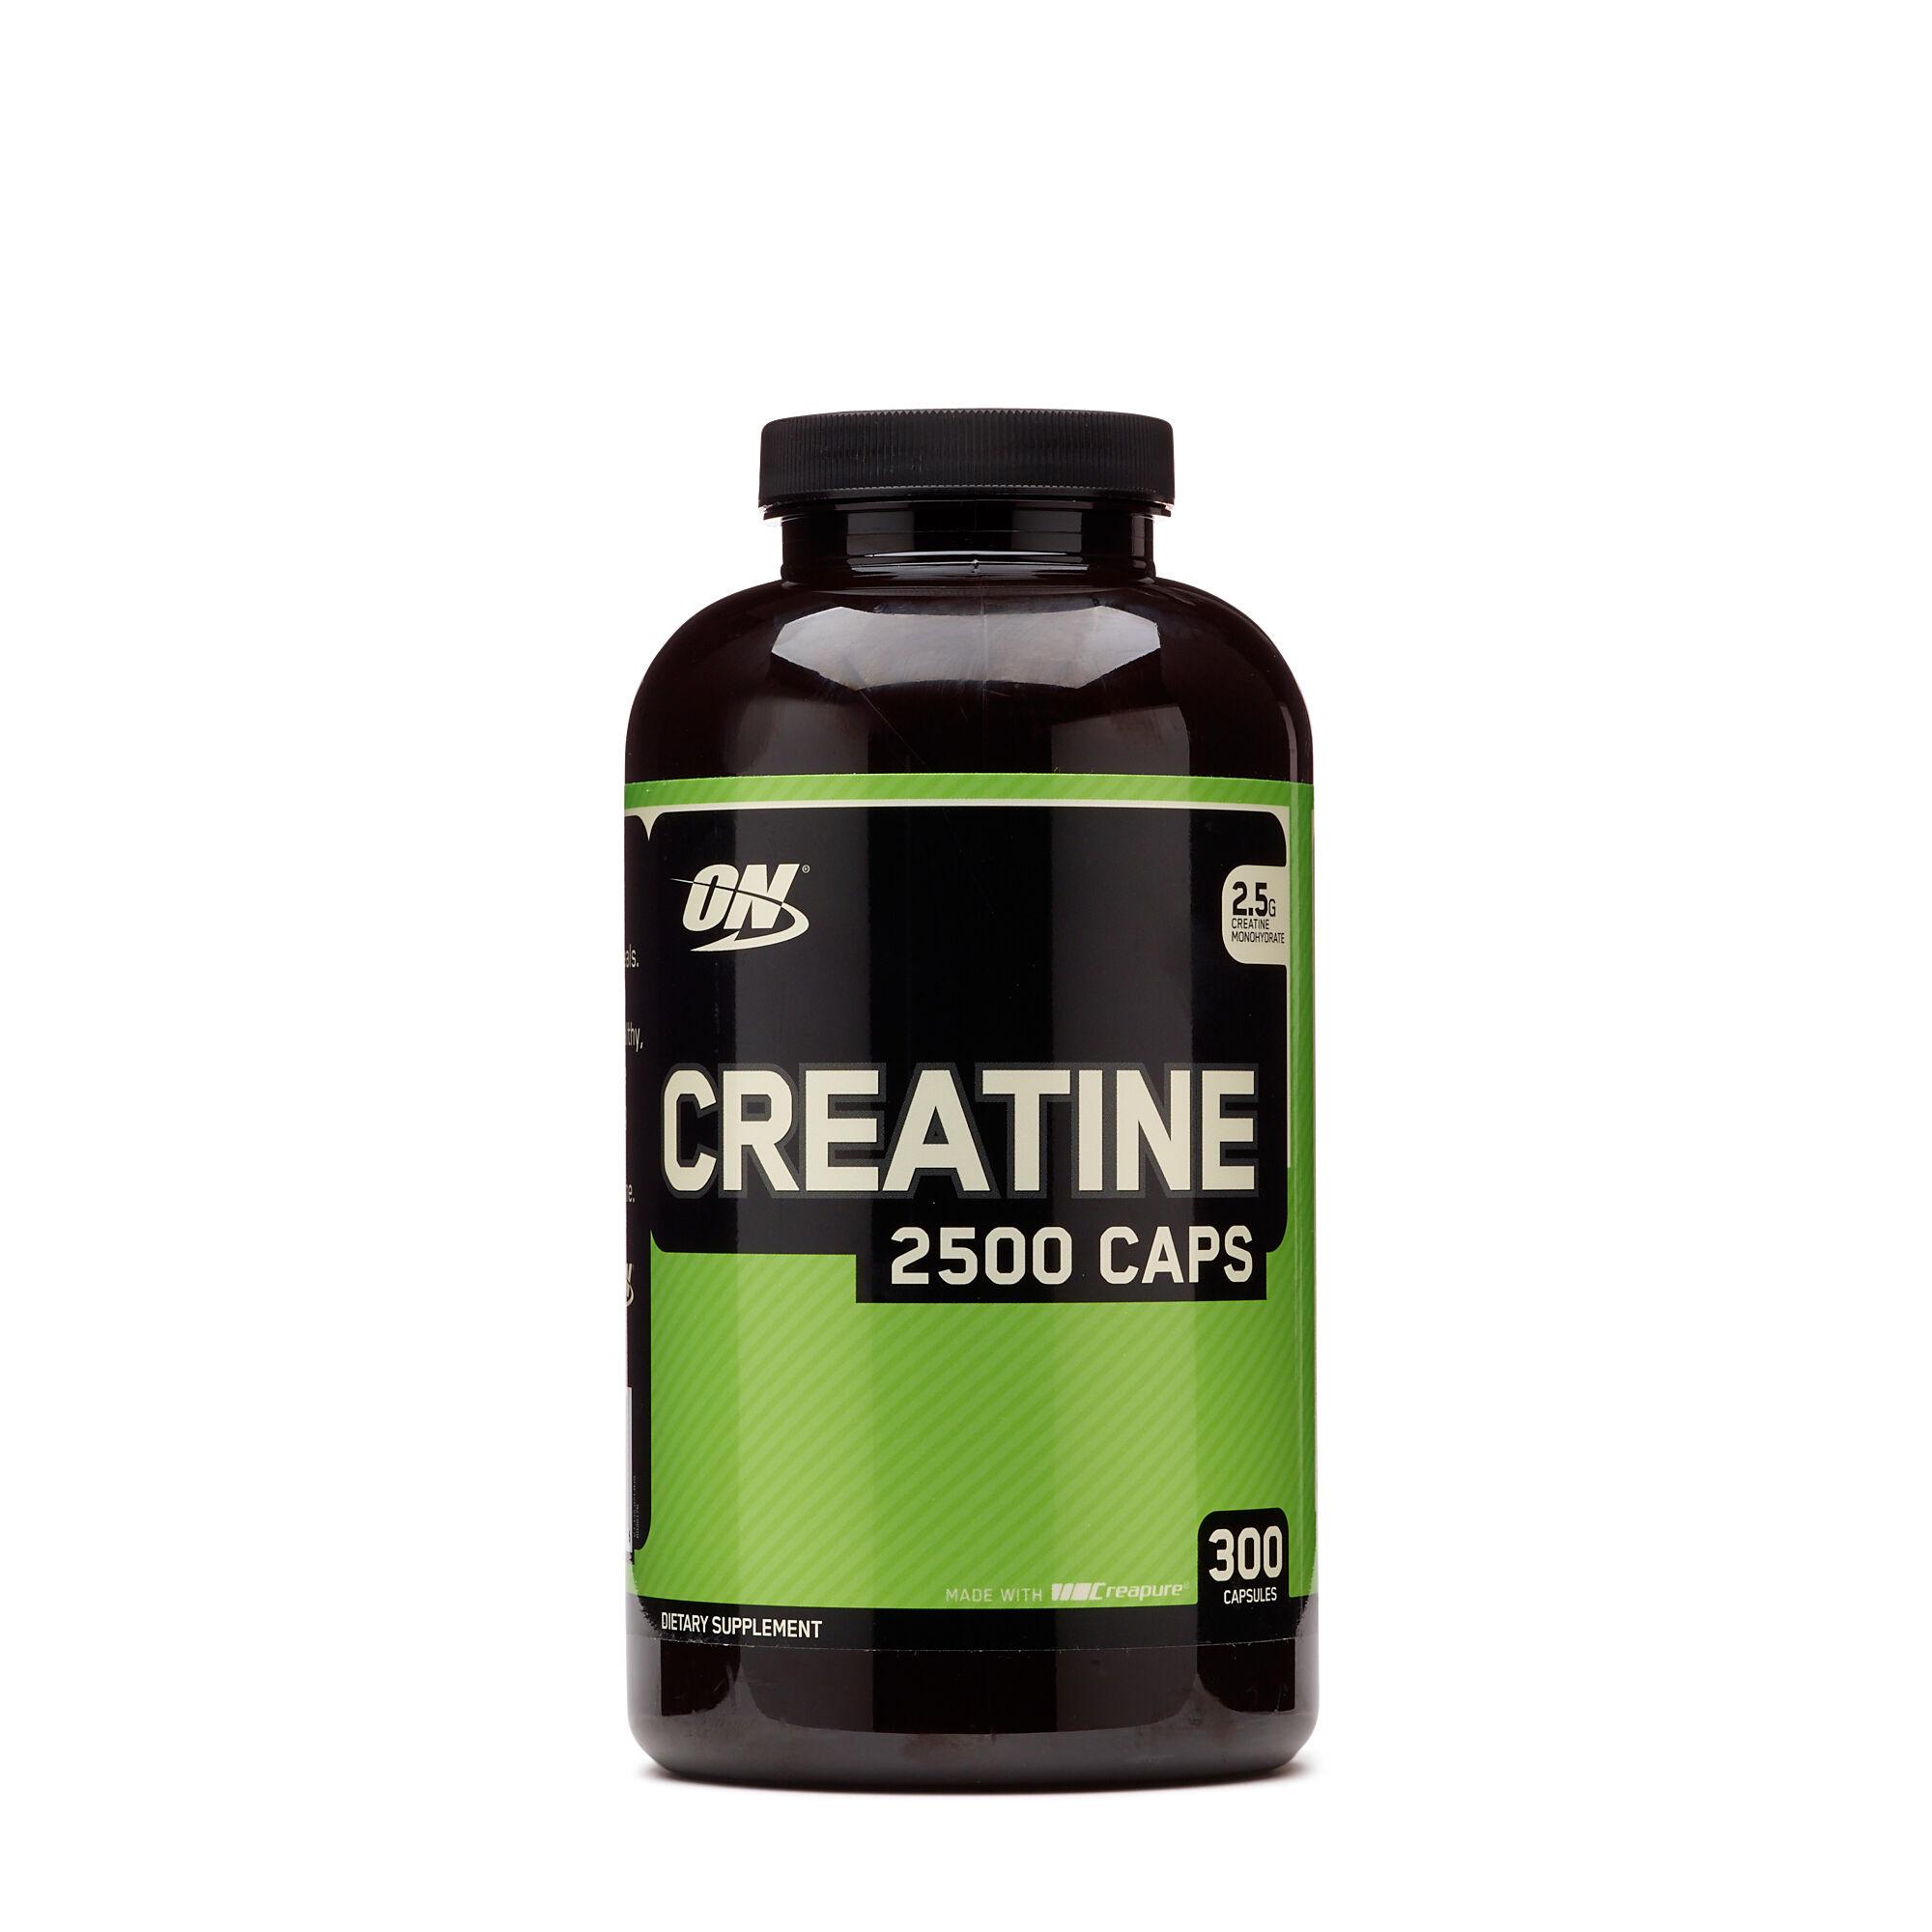 Allmax Nutrition Creatine Gnc – Nutrition Ftempo